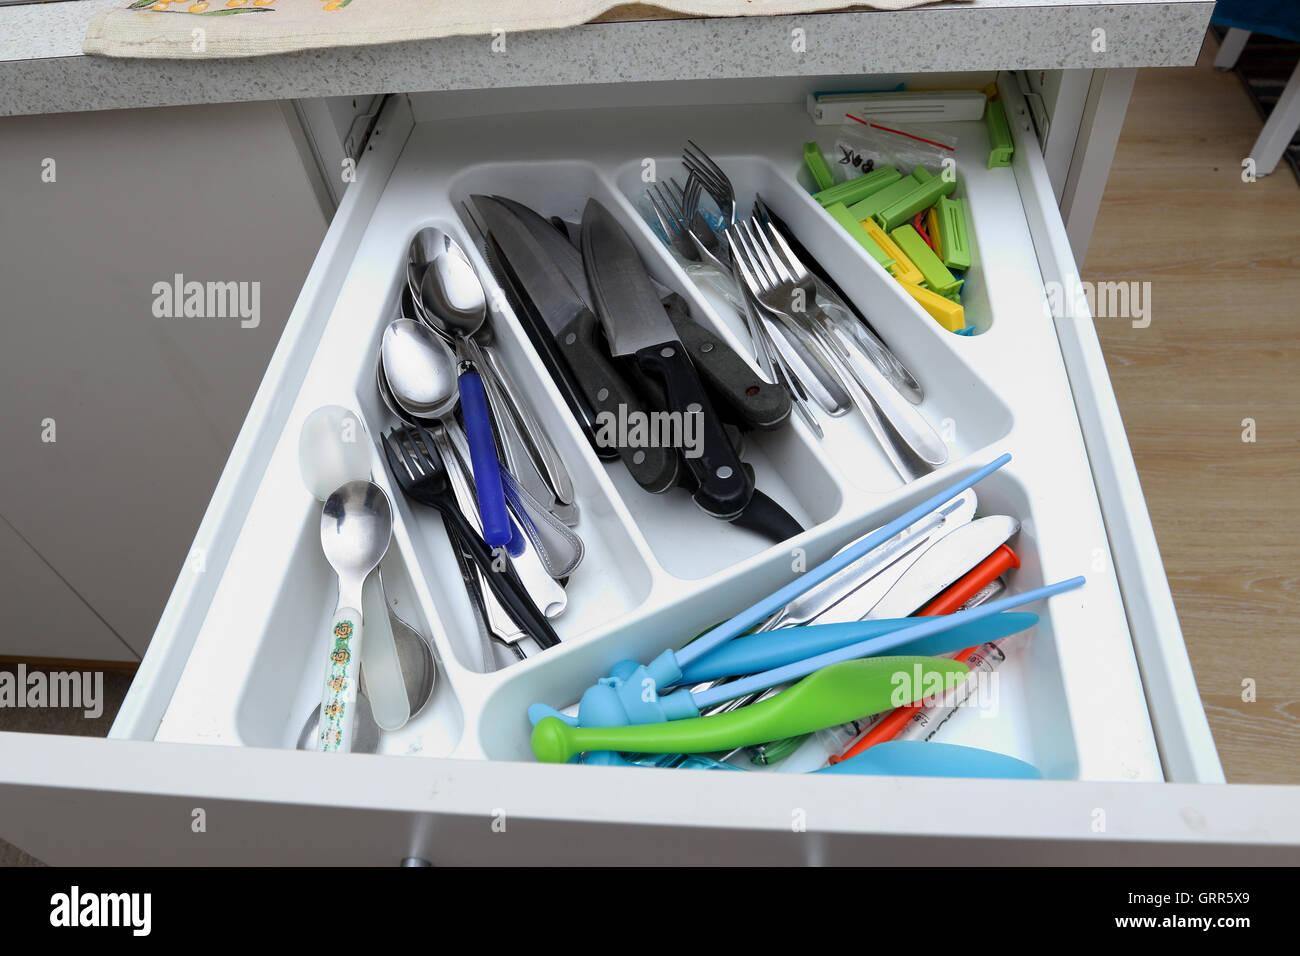 Drawer Handles Stockfotos & Drawer Handles Bilder - Alamy